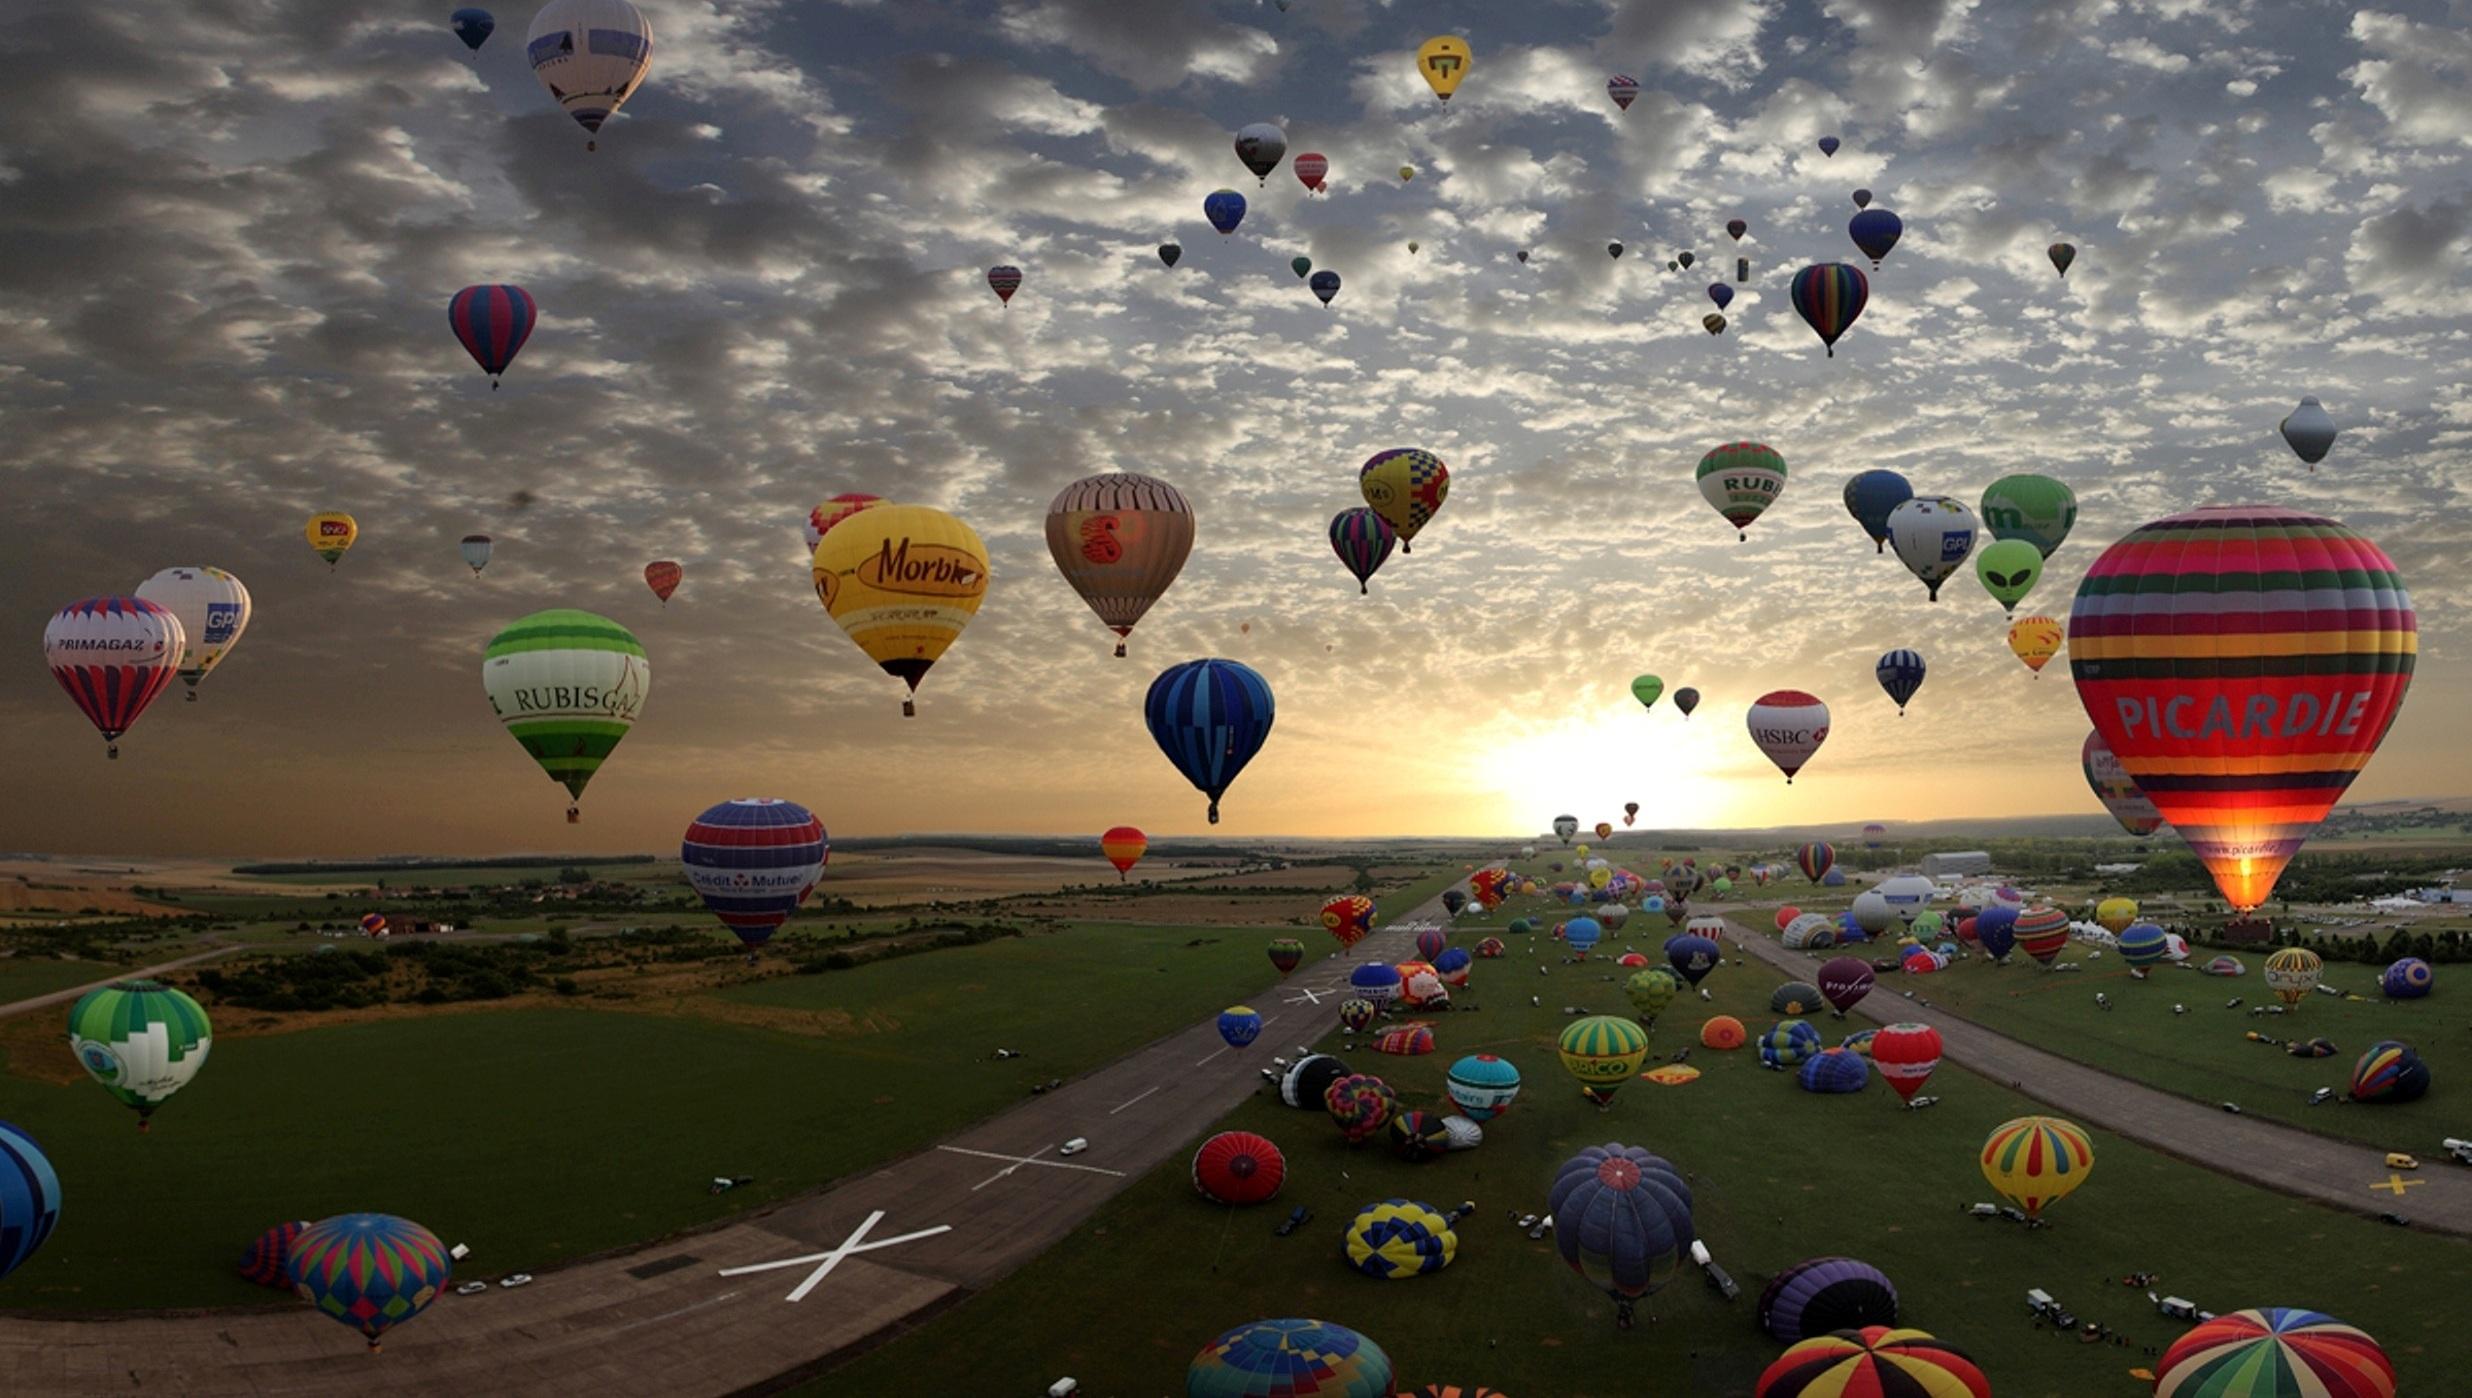 Air Balloons General Balloon Wallpaper 2472x1398 Full HD Wallpapers 2472x1398